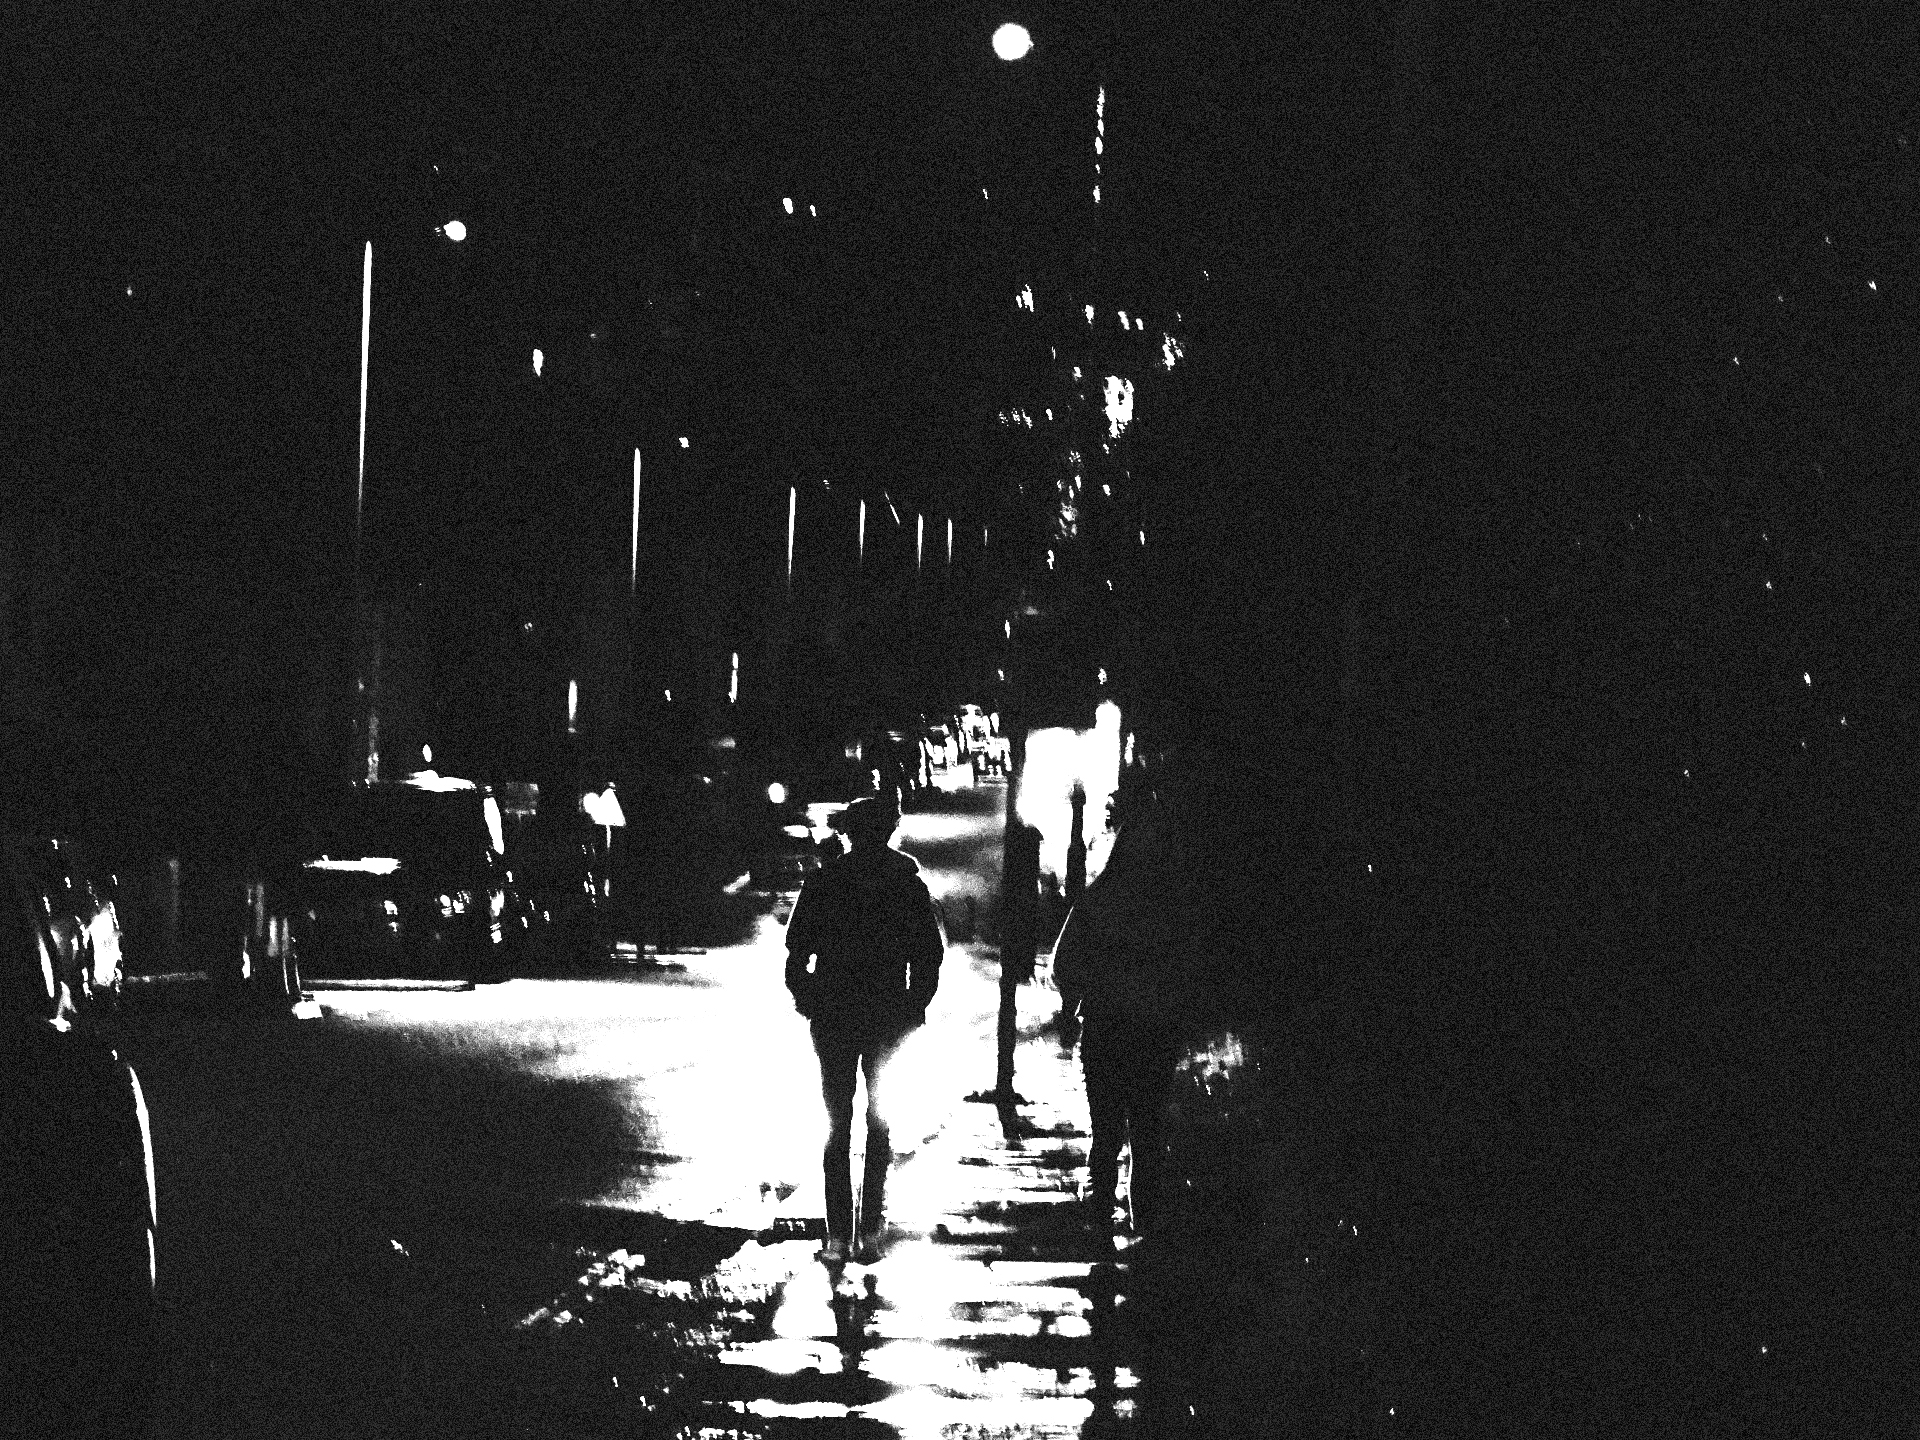 noir-1.jpg